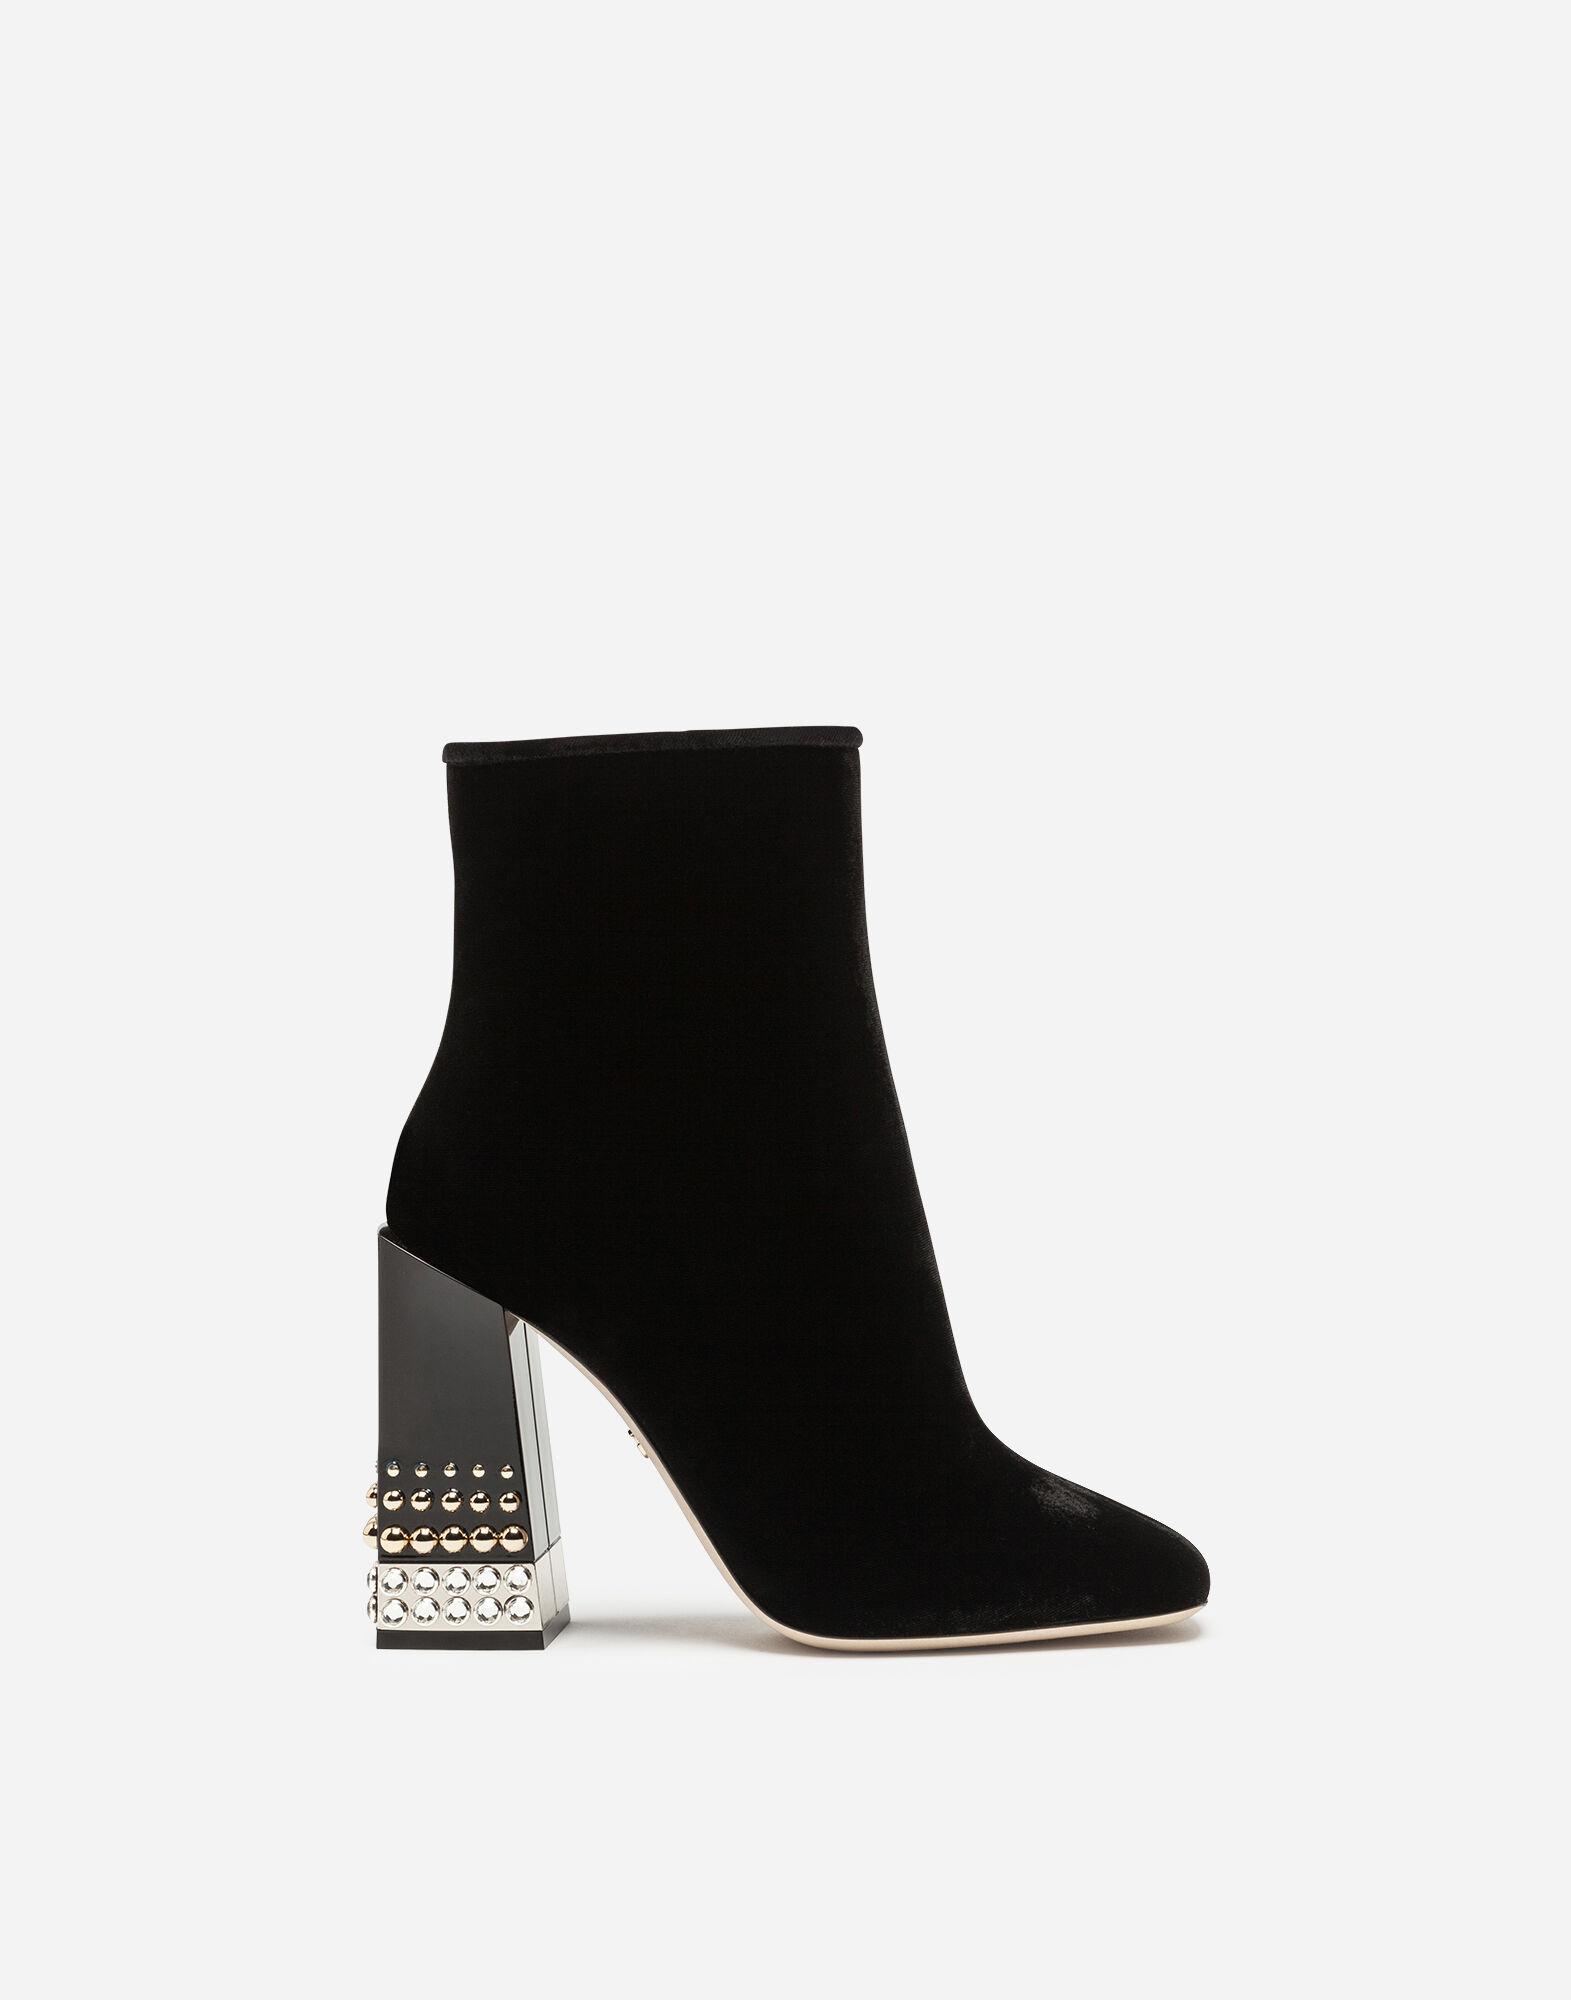 Segunda mano - Tacones de Terciopelo Dolce & Gabbana isCEk